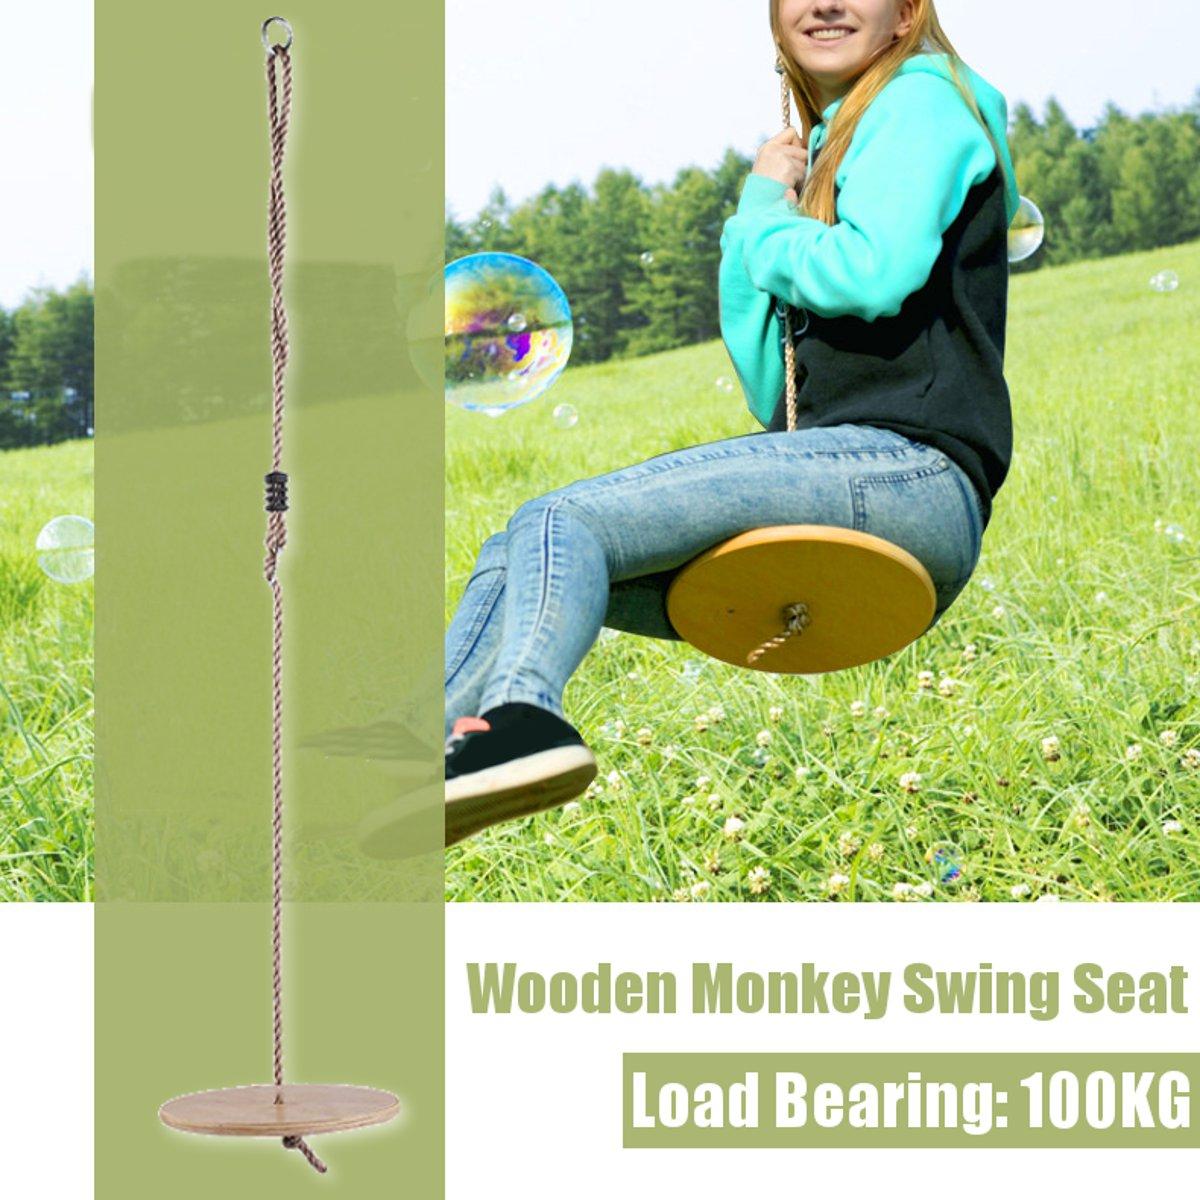 30cm Round Garden Tree Swing Wooden Kids Toy Swing Outdoor/Indoor Hanging Children Playing Seat Gifts 1.8m Rope 100KG Safe